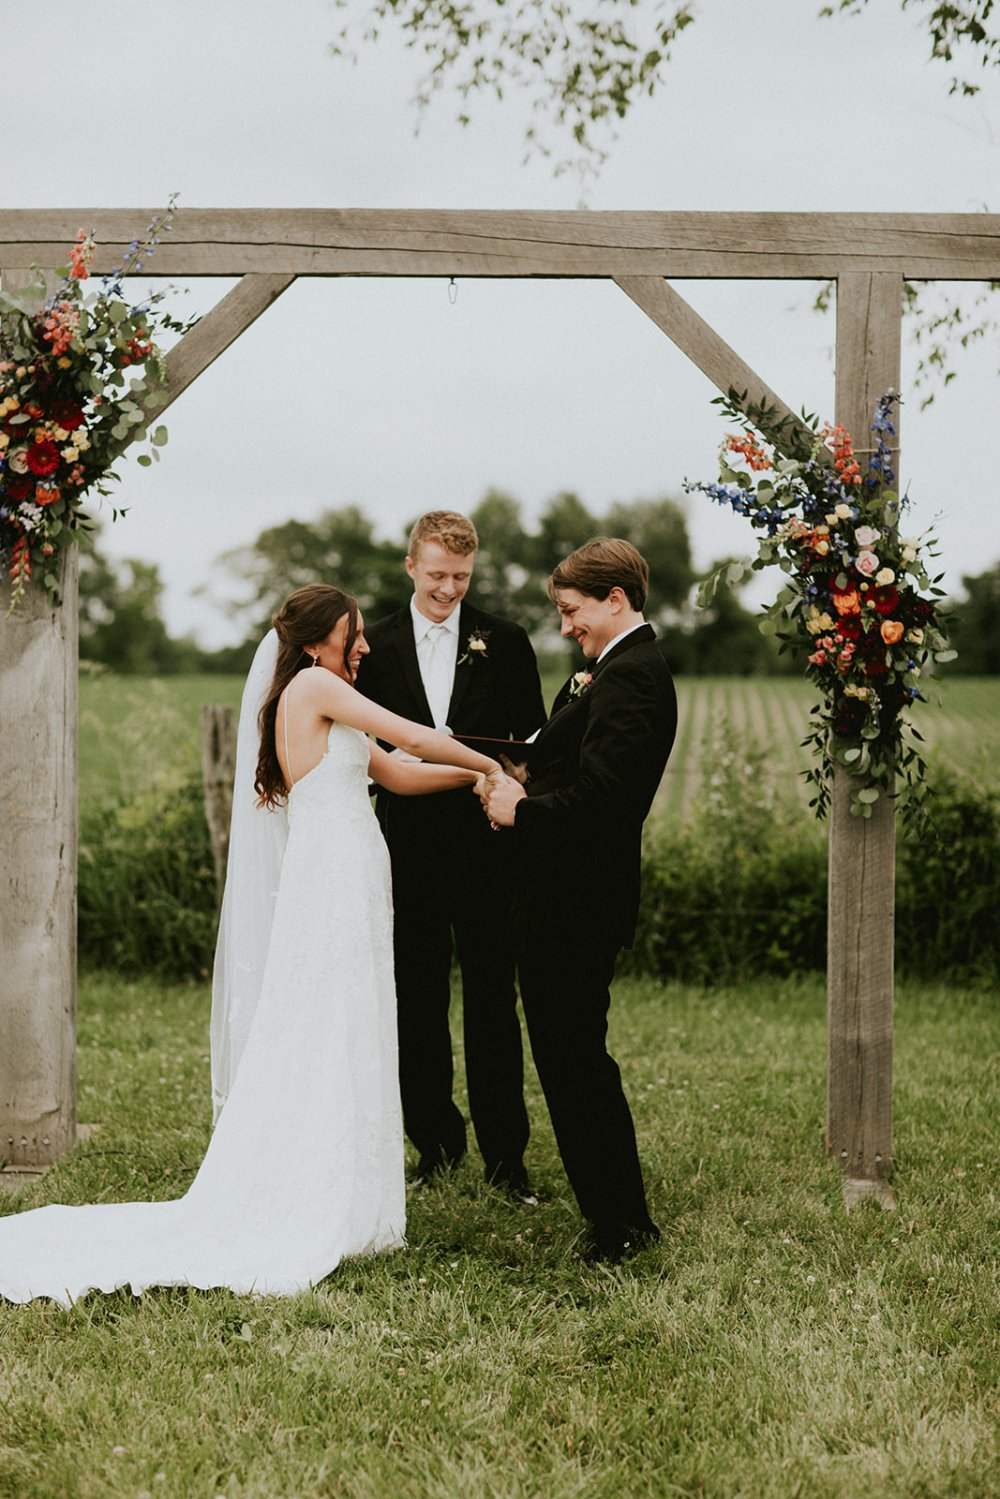 Calan-Adam-WEDDING-JUNE-2019-144 2.jpg